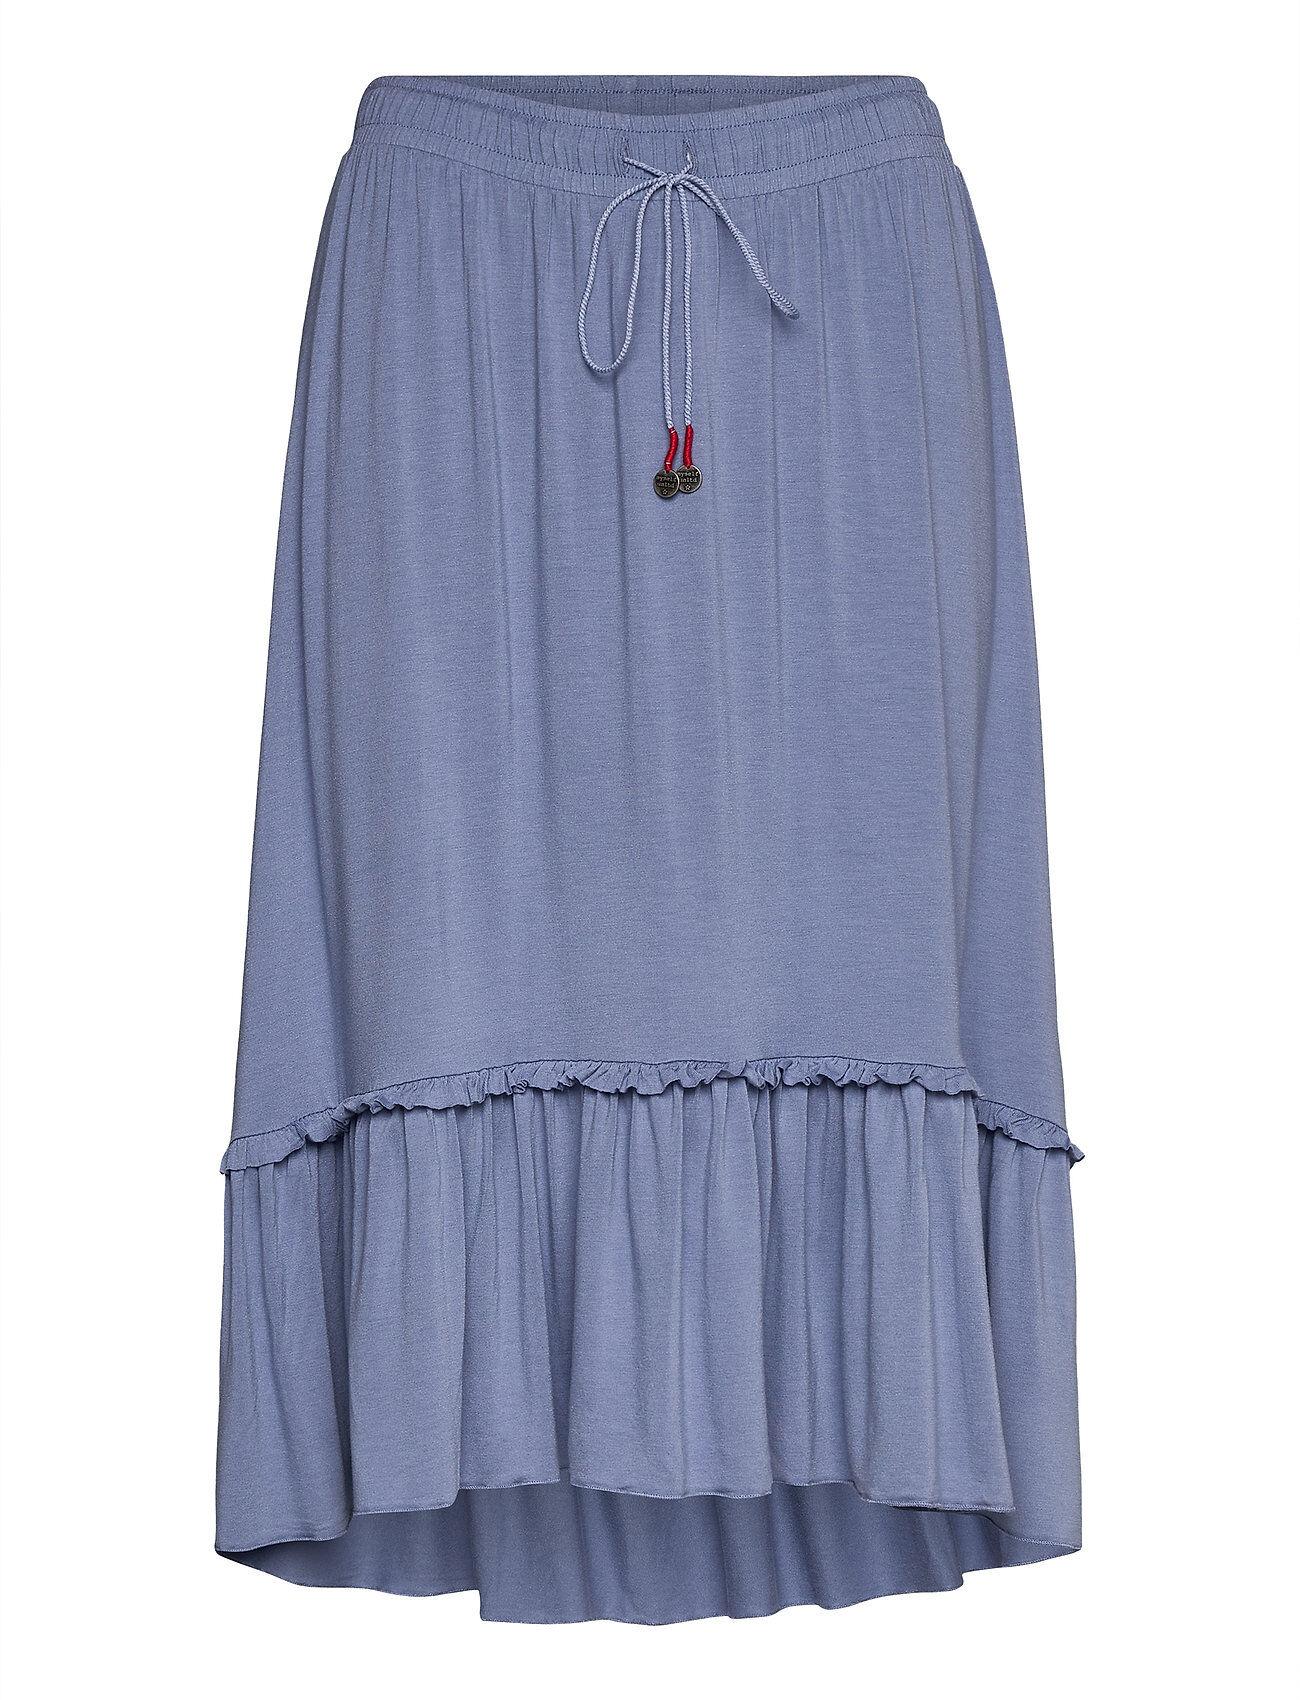 ODD MOLLY My Beloved Skirt Polvipituinen Hame Sininen ODD MOLLY